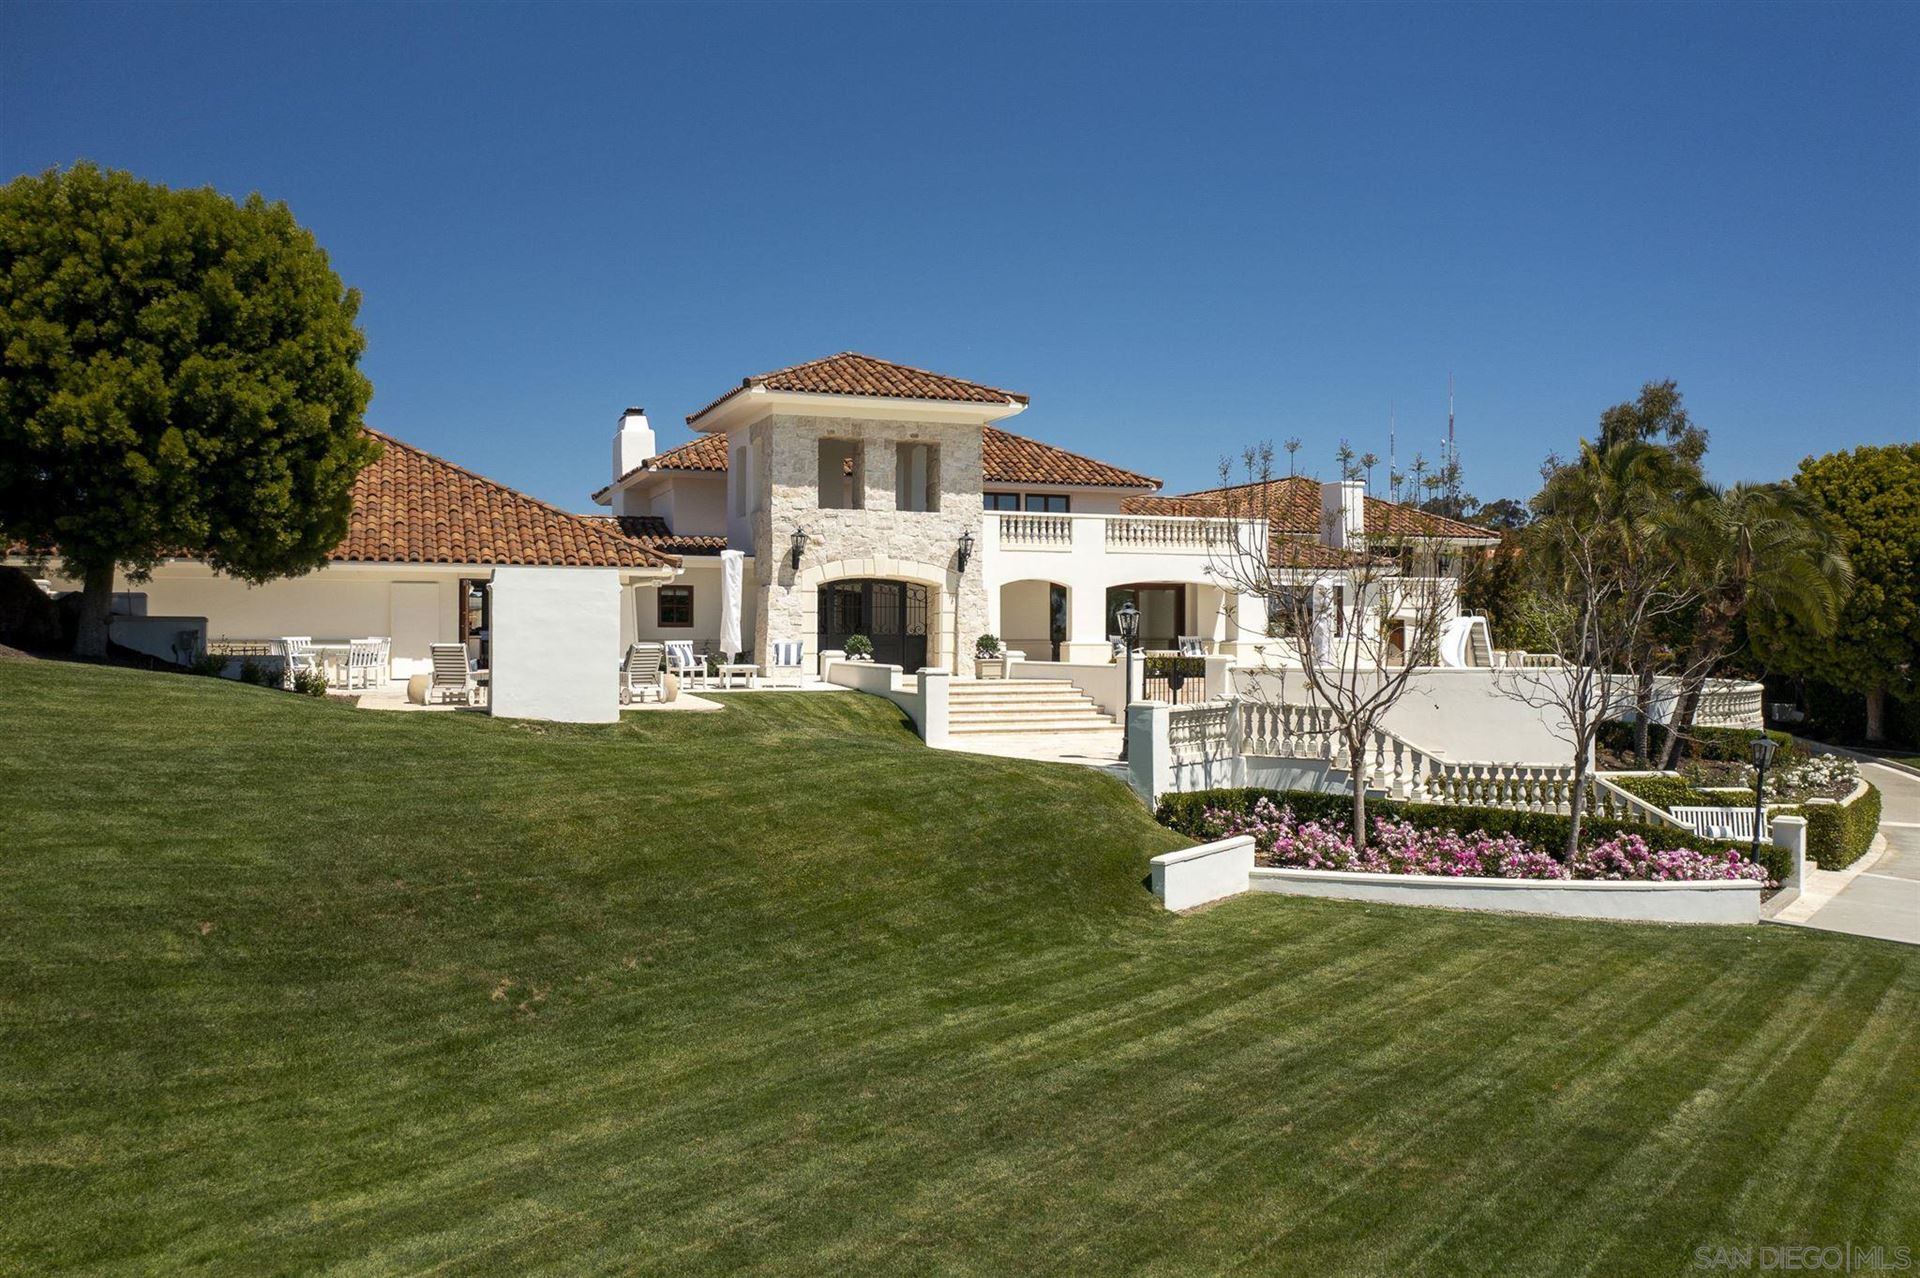 Photo of 6404 La Jolla Scenic Drive, La Jolla, CA 92037 (MLS # 210012274)